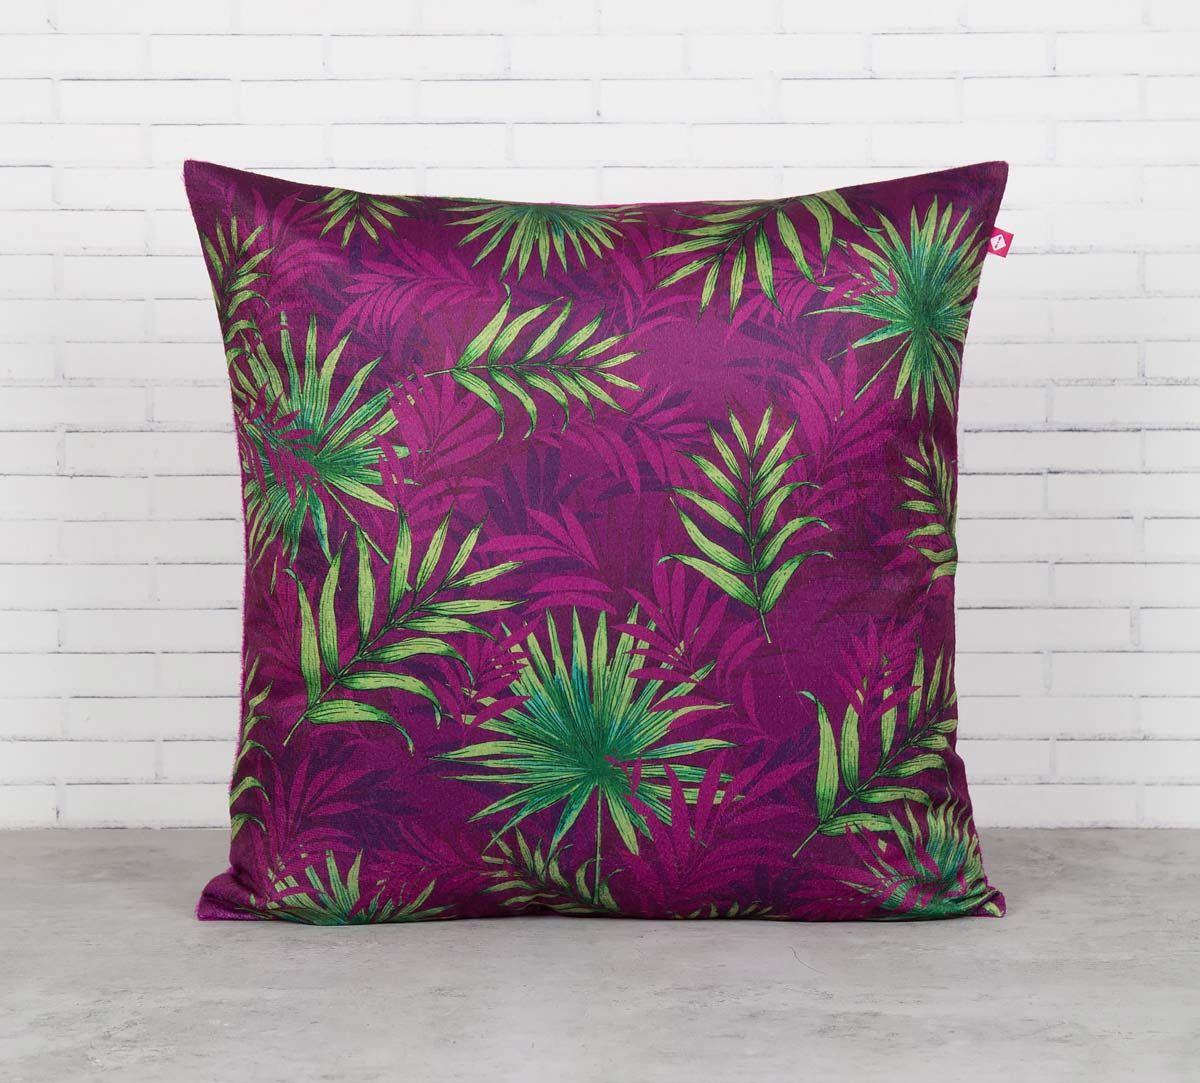 India Circus Sangria Tropical Fall Blended Velvet Cushion Cover